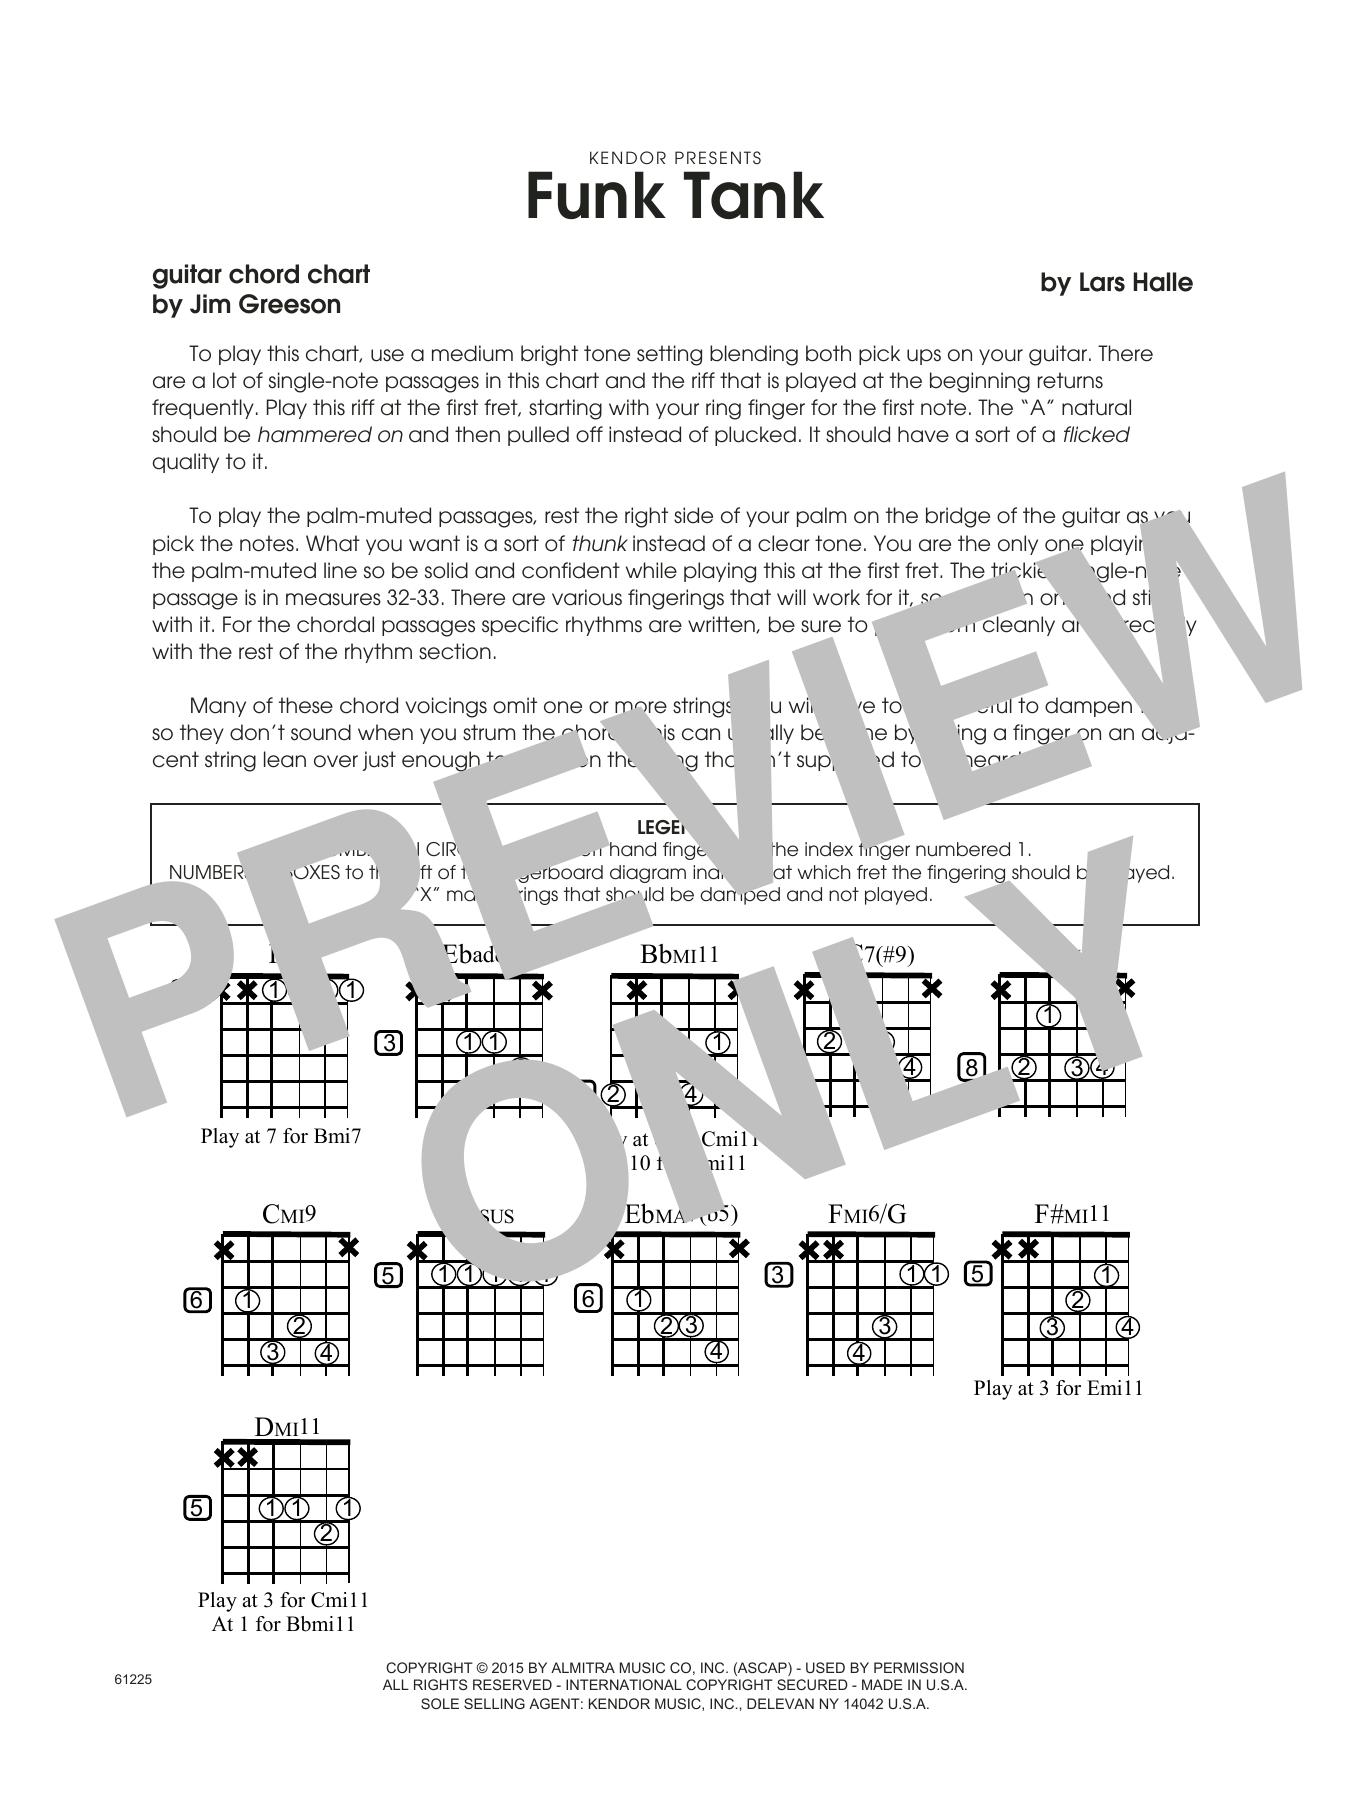 Funk Tank - Guitar Chord Chart Sheet Music